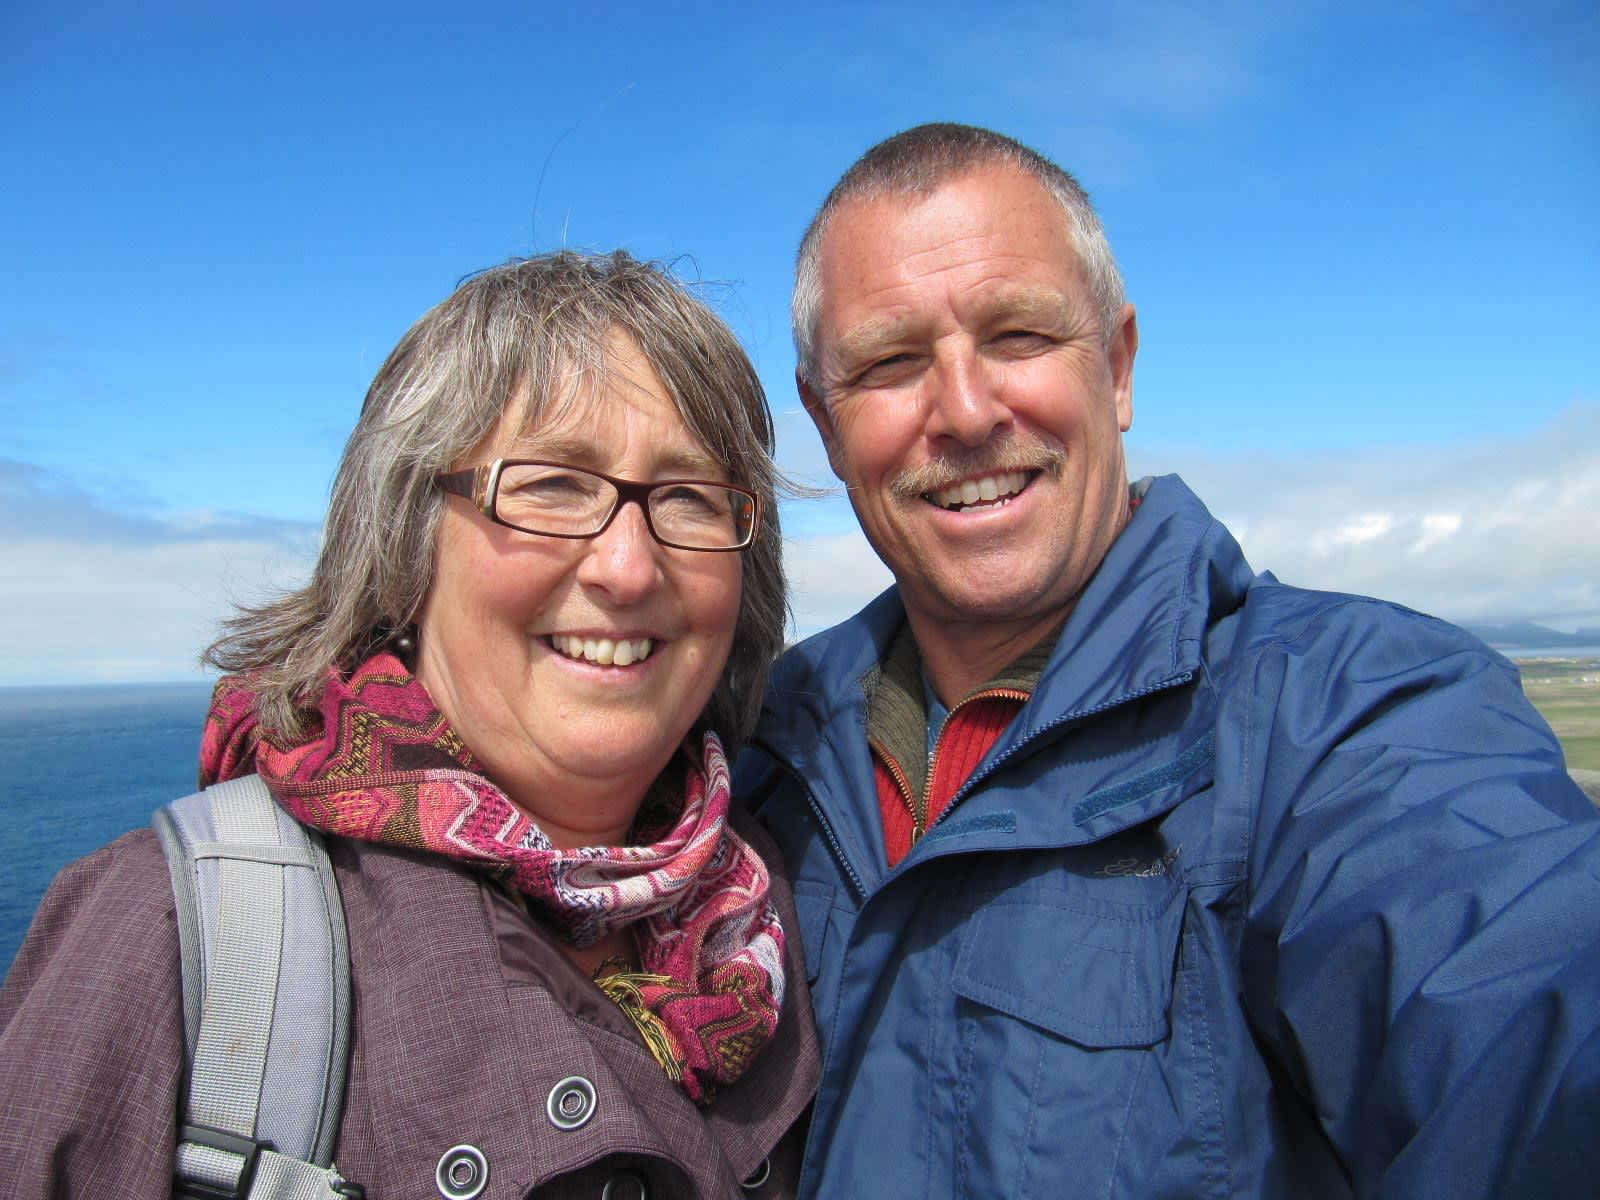 Karen & Stephen from Kelowna, British Columbia, Canada